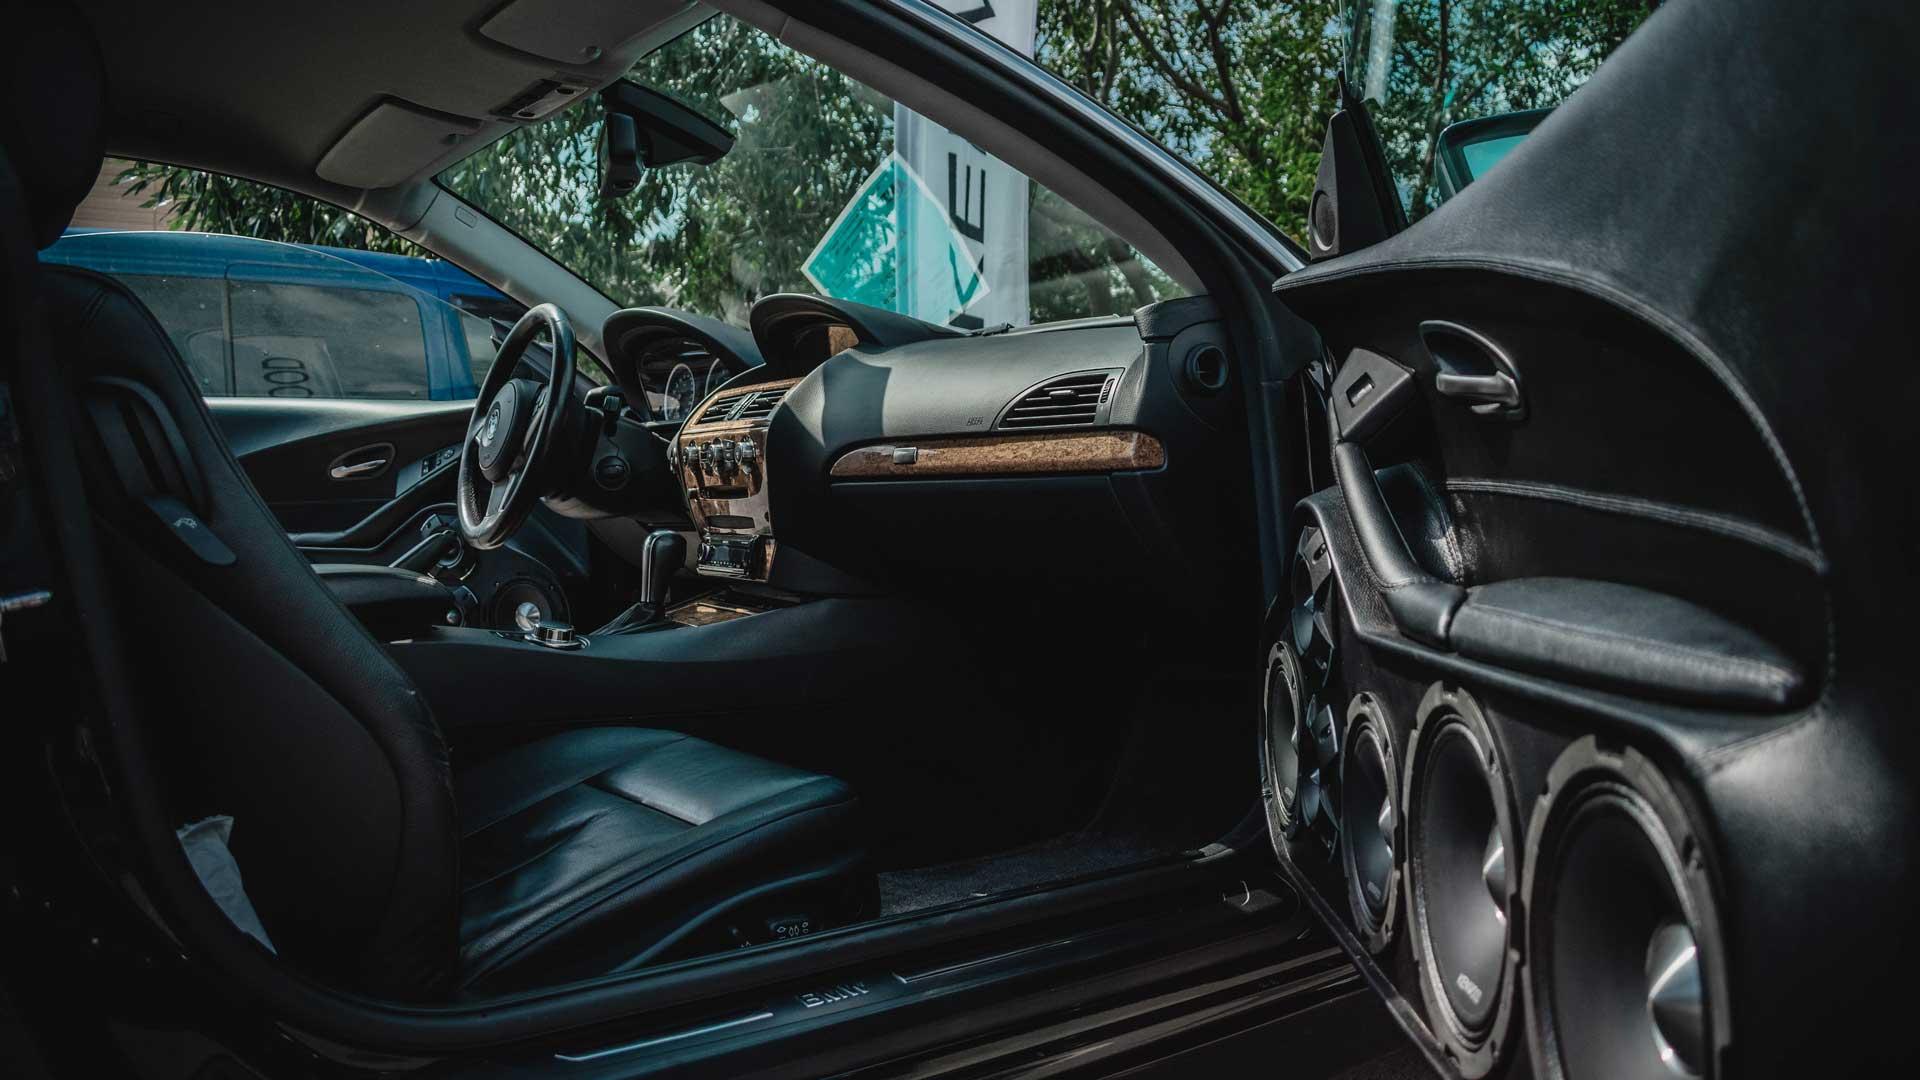 Smart-Car-Air-Purifier-on-TheSunrisePost